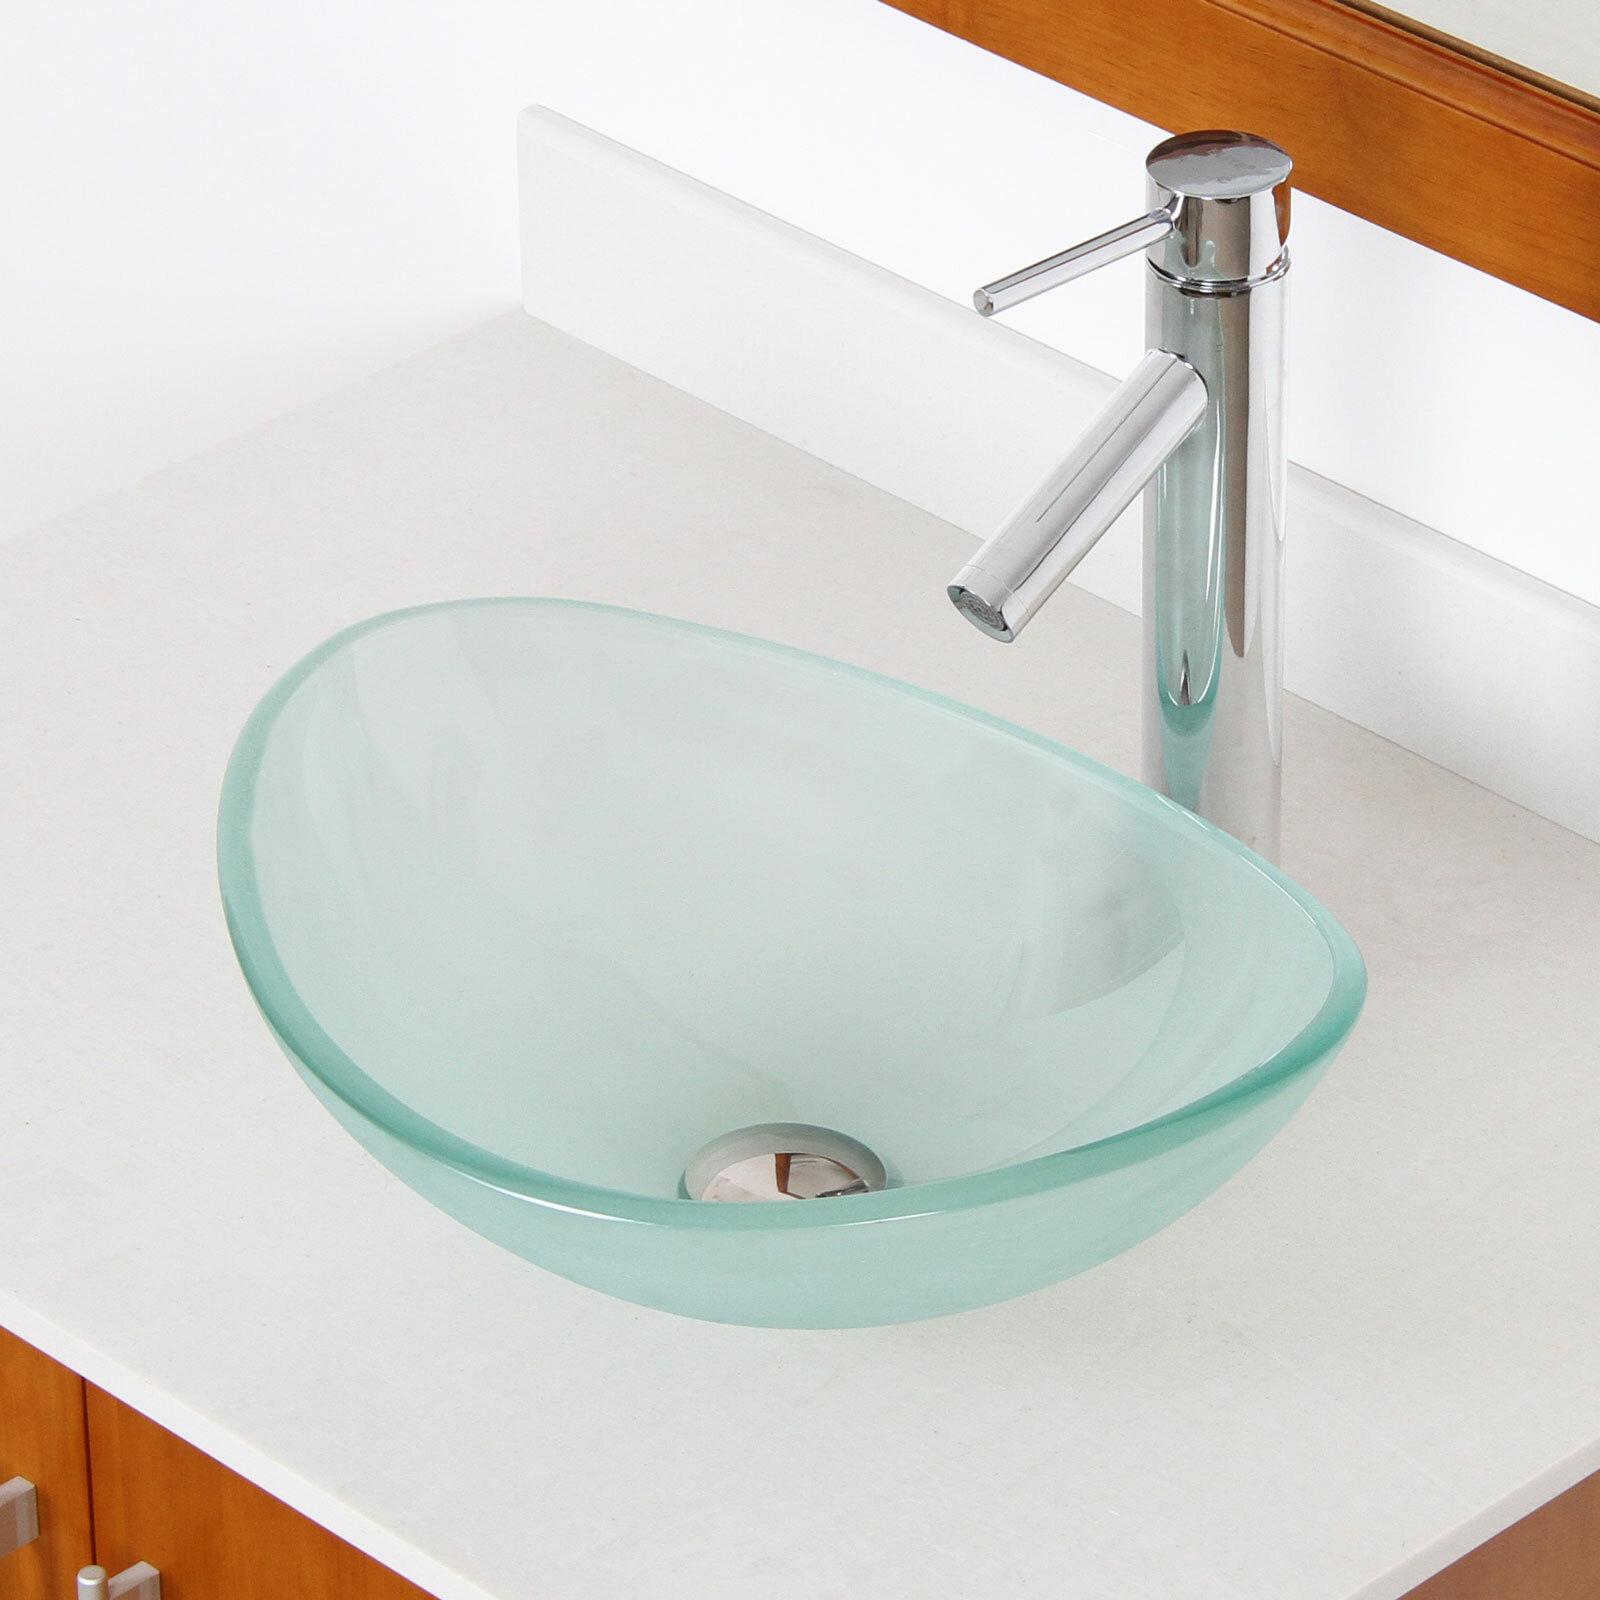 Elite Mini Tempered Glass Oval Vessel Bathroom Sink & Reviews | Wayfair